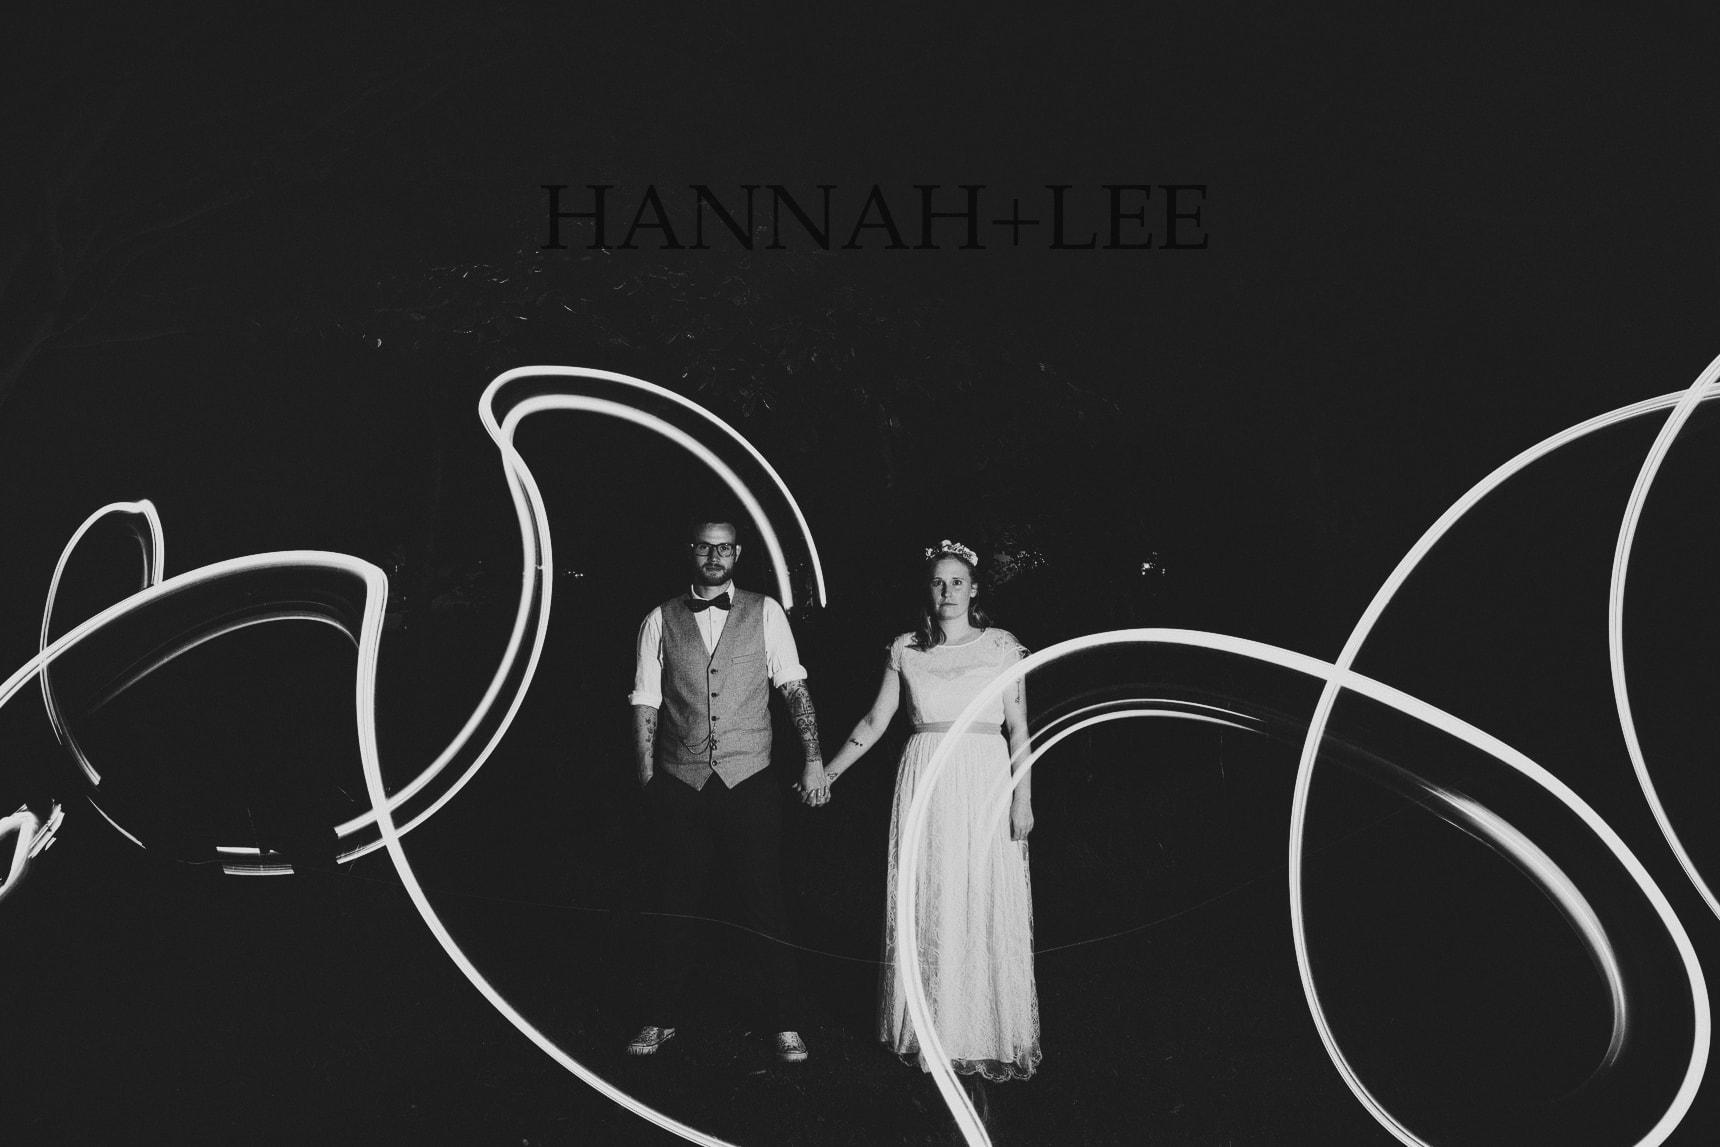 hannah-lee-wedding